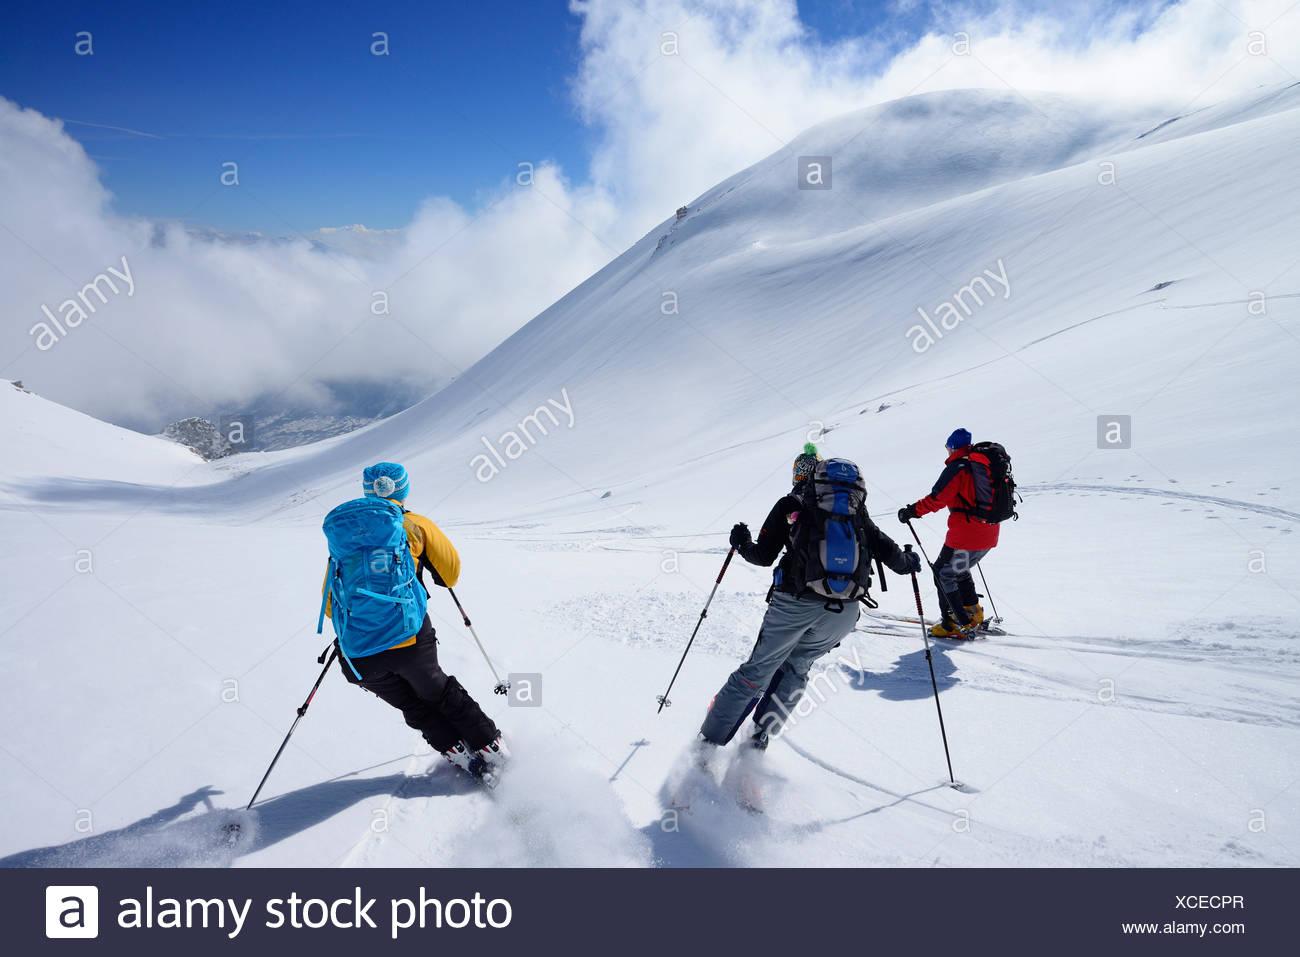 Three backcountry skiers downhill skiing from Monte Pesco Falcone, Rava del Ferro, Maiella, Abruzzo, Italy - Stock Image